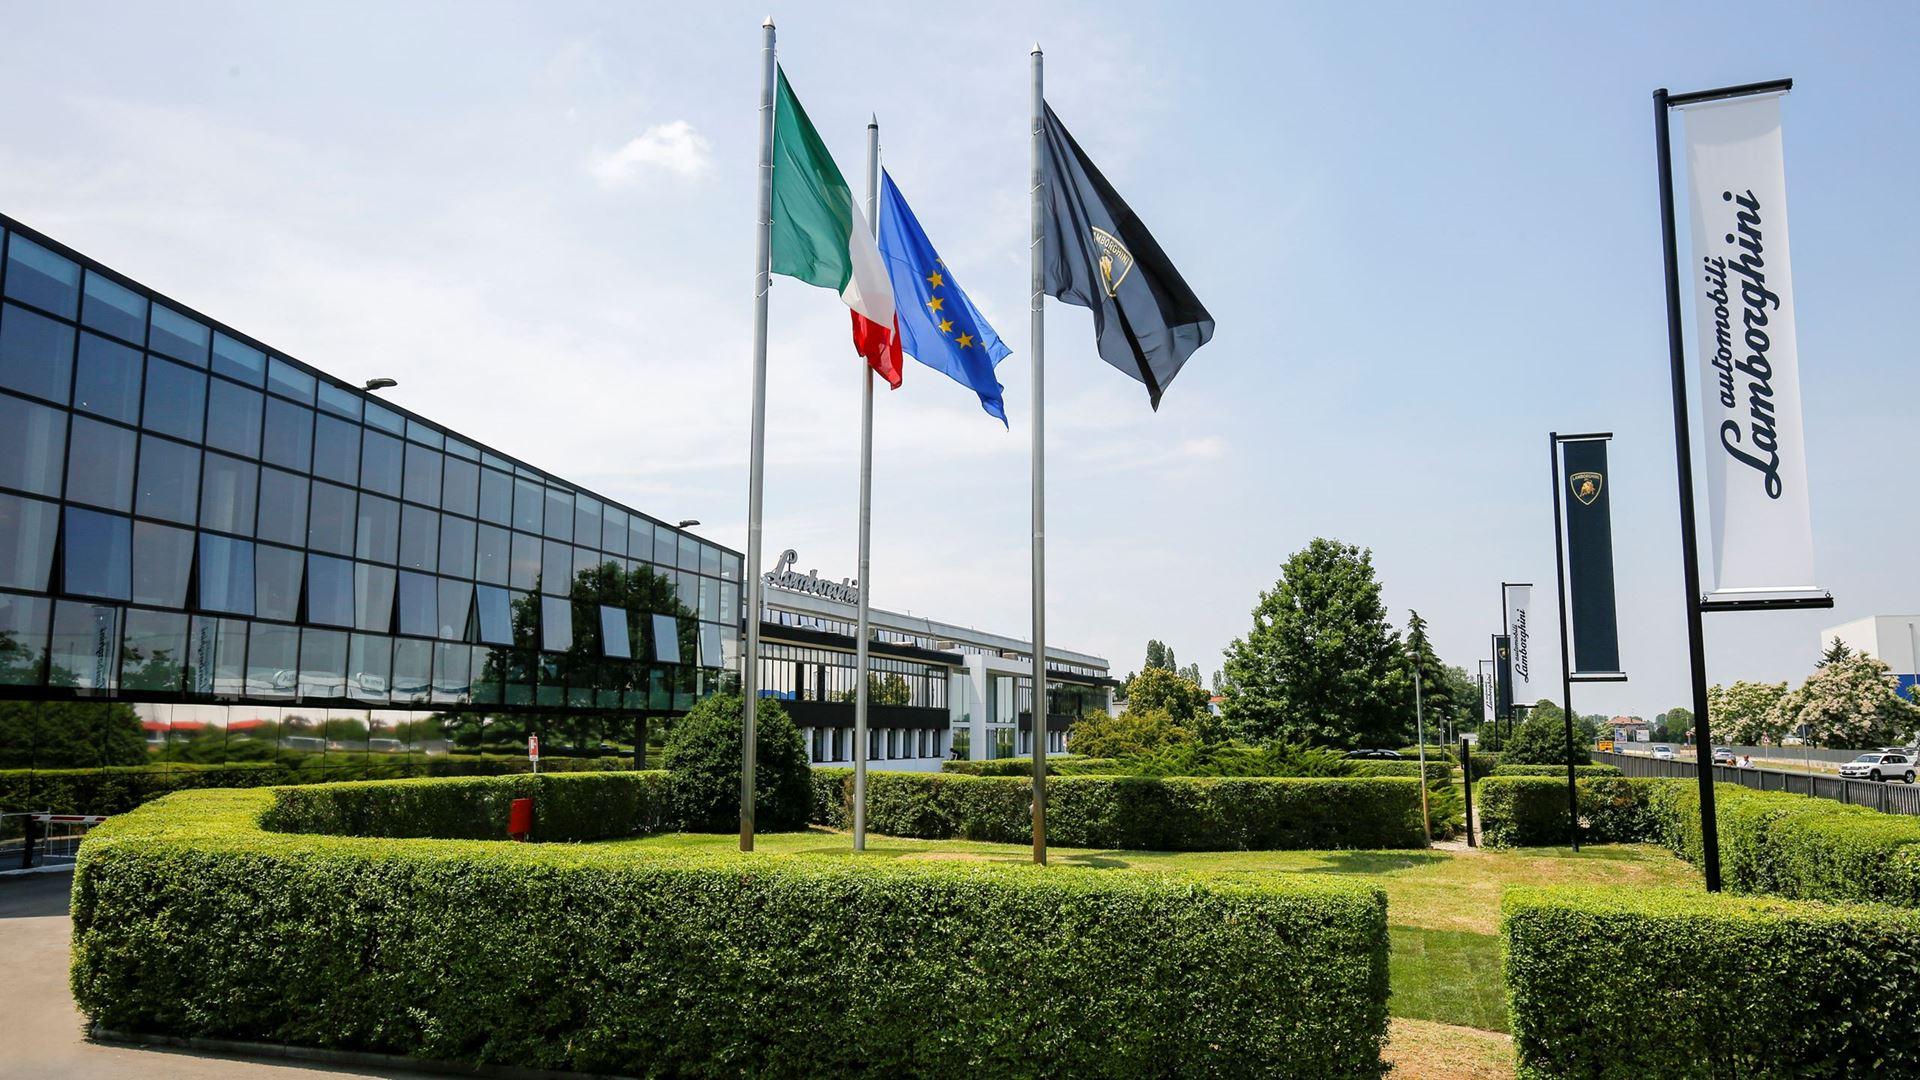 Automobili Lamborghini: sales soaring, record first quarter - Image 7